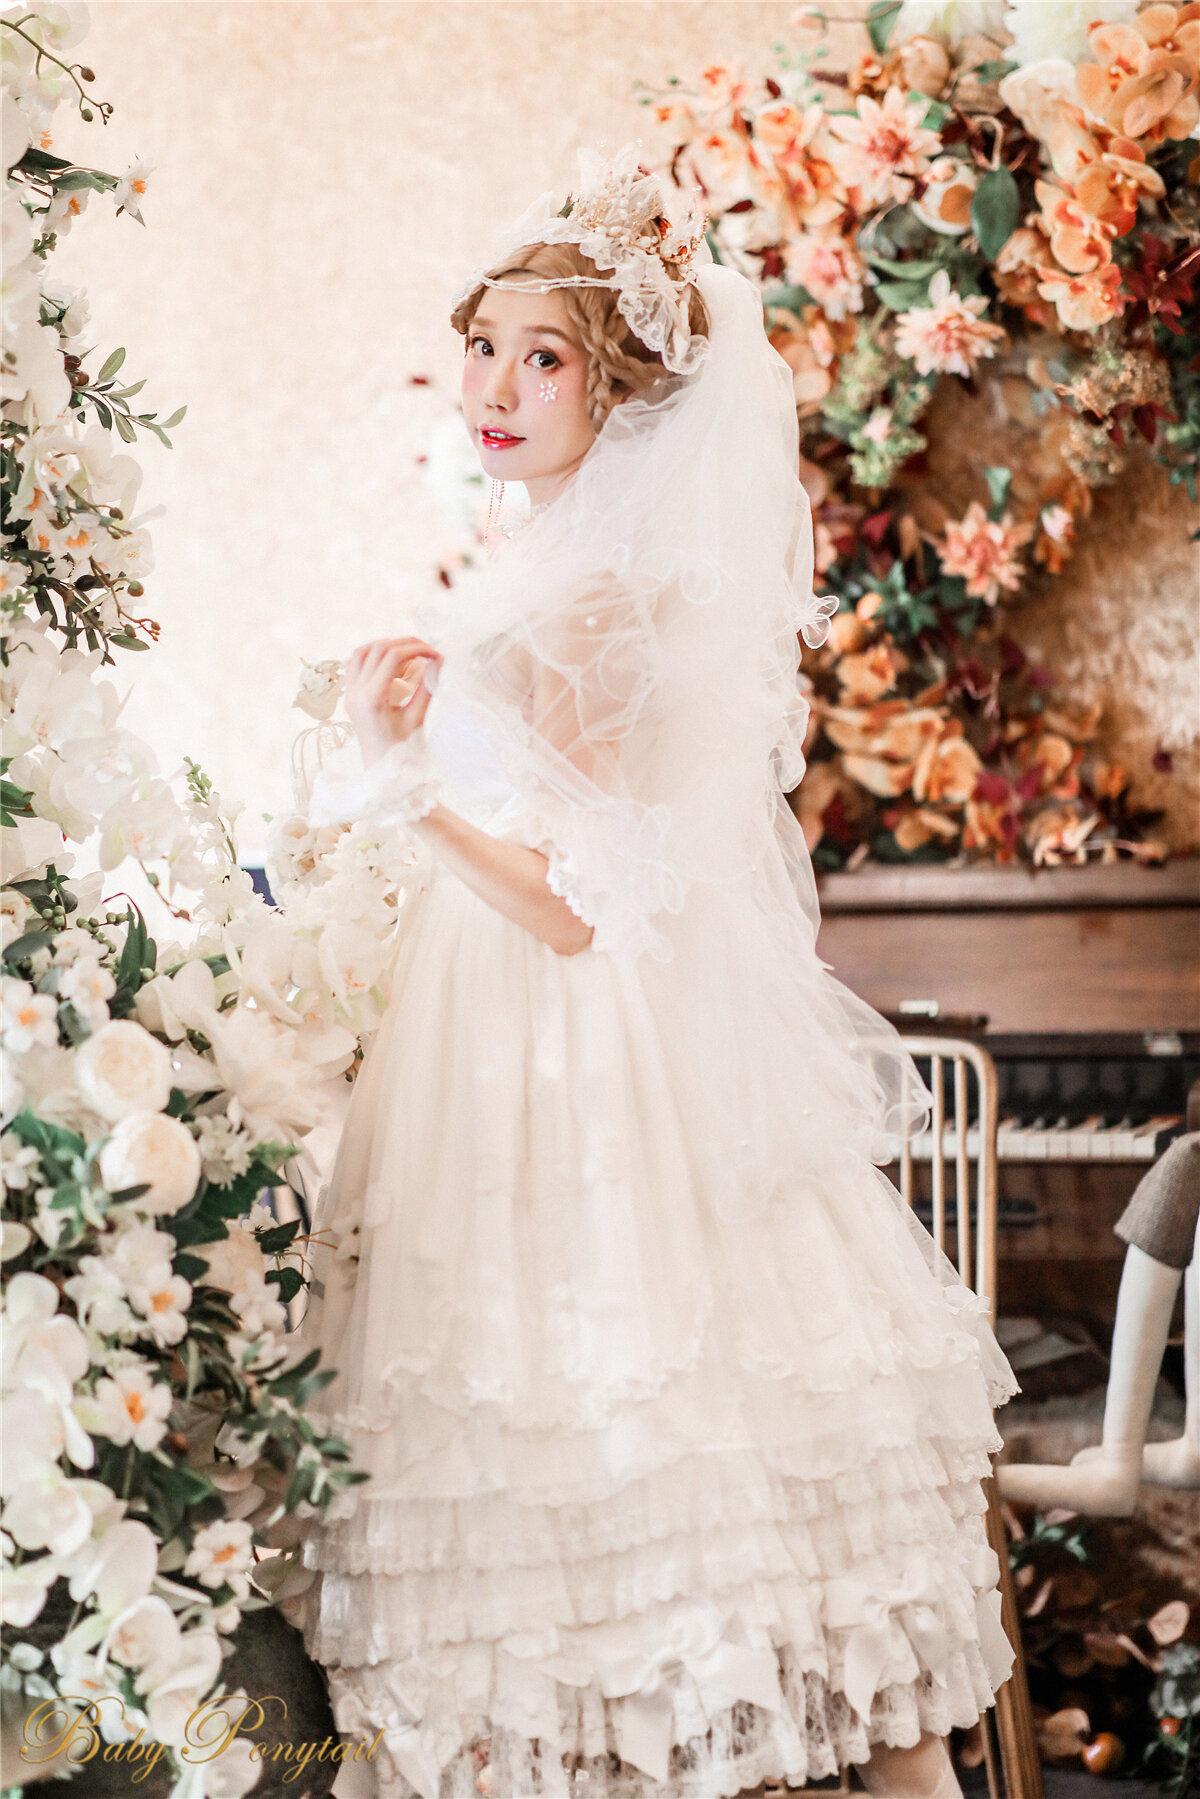 Babyponytail_Heavenly Teardrops_Model photo_JSK white_kaka_02.jpg